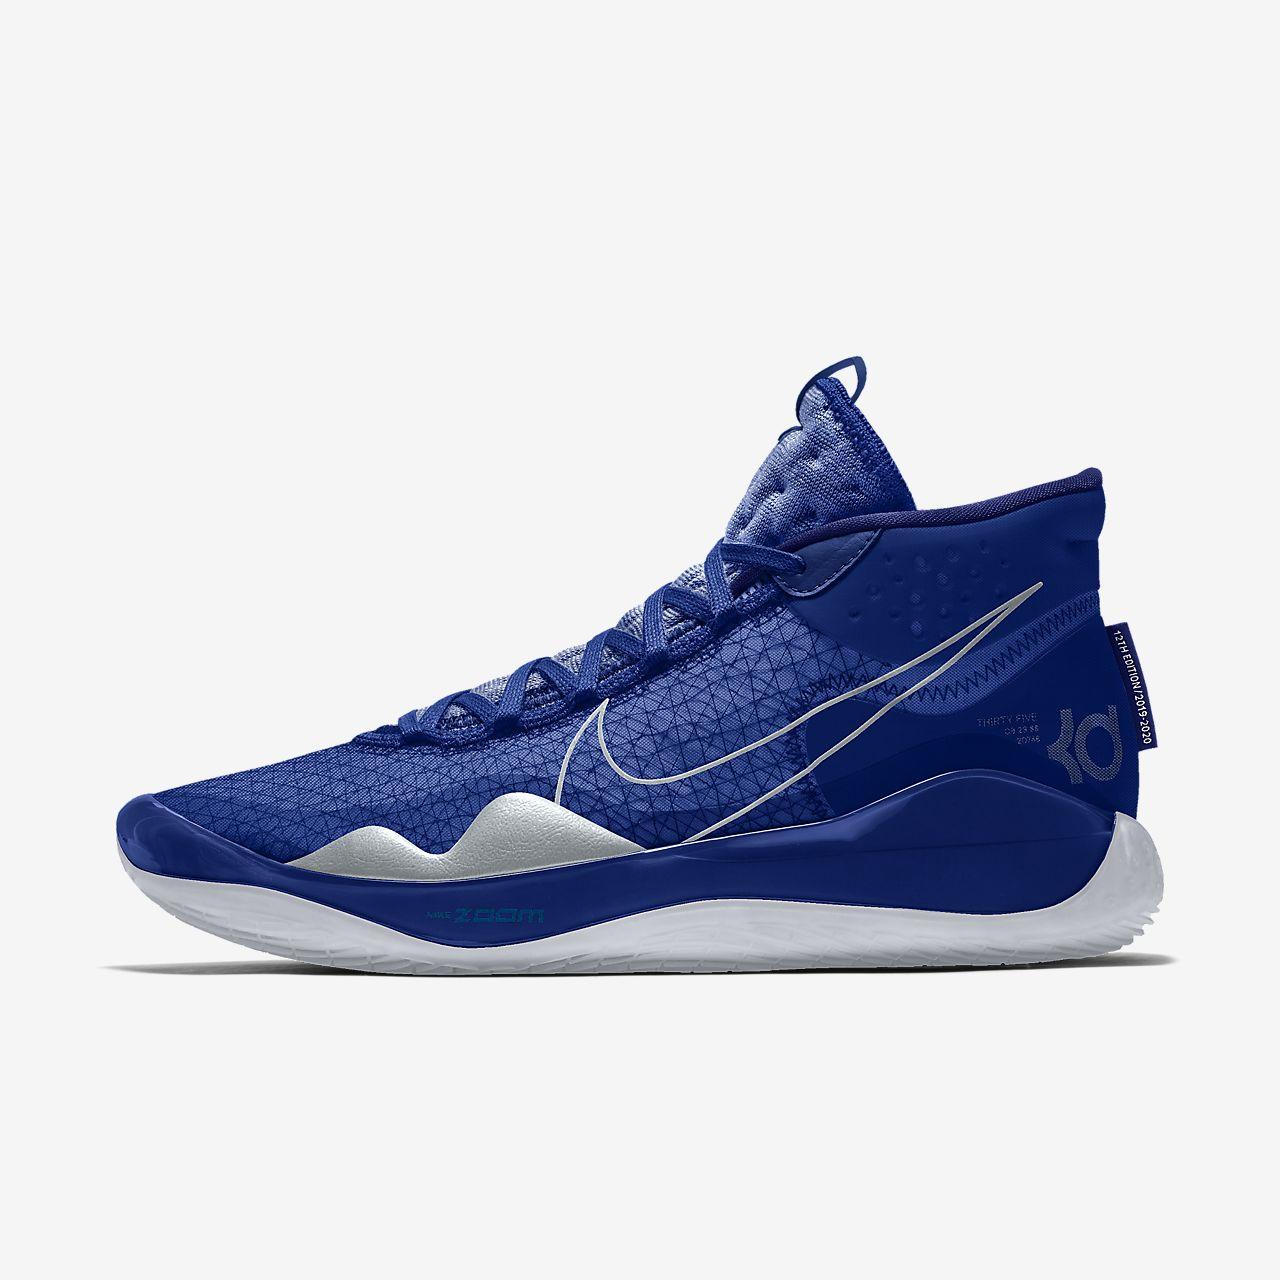 Nike Zoom KD12 By You personalisierbarer Basketballschuh